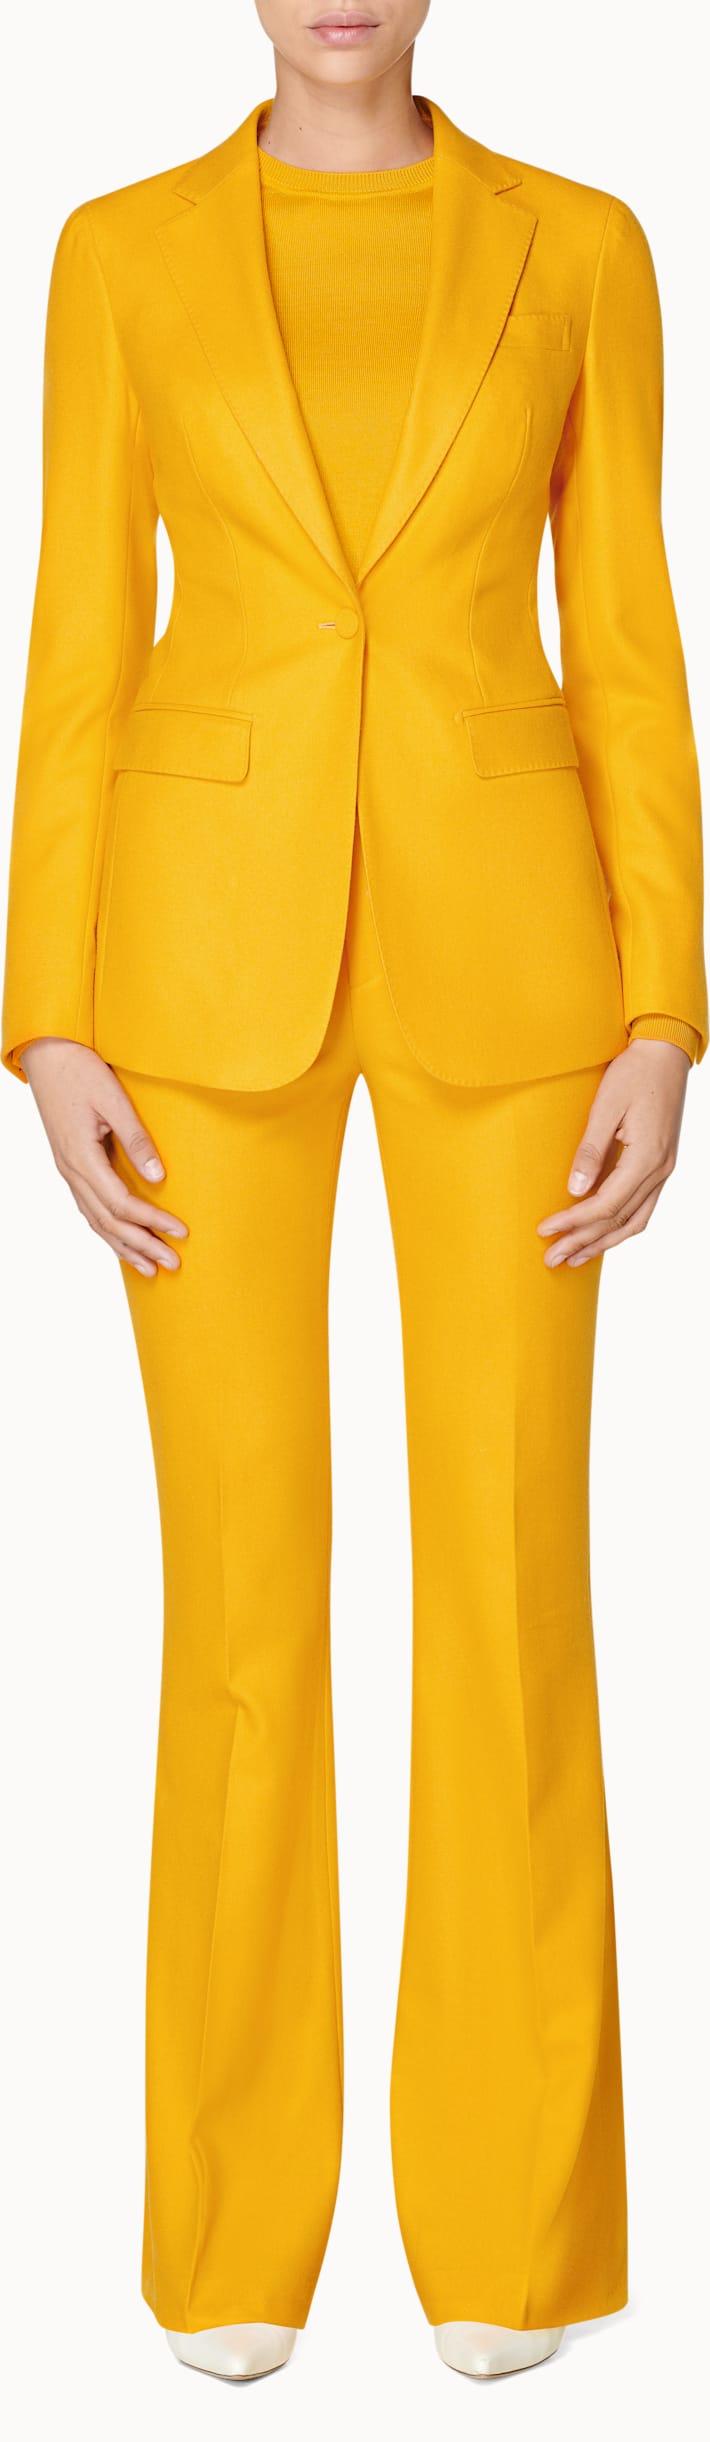 Cameron Sunshine Suit